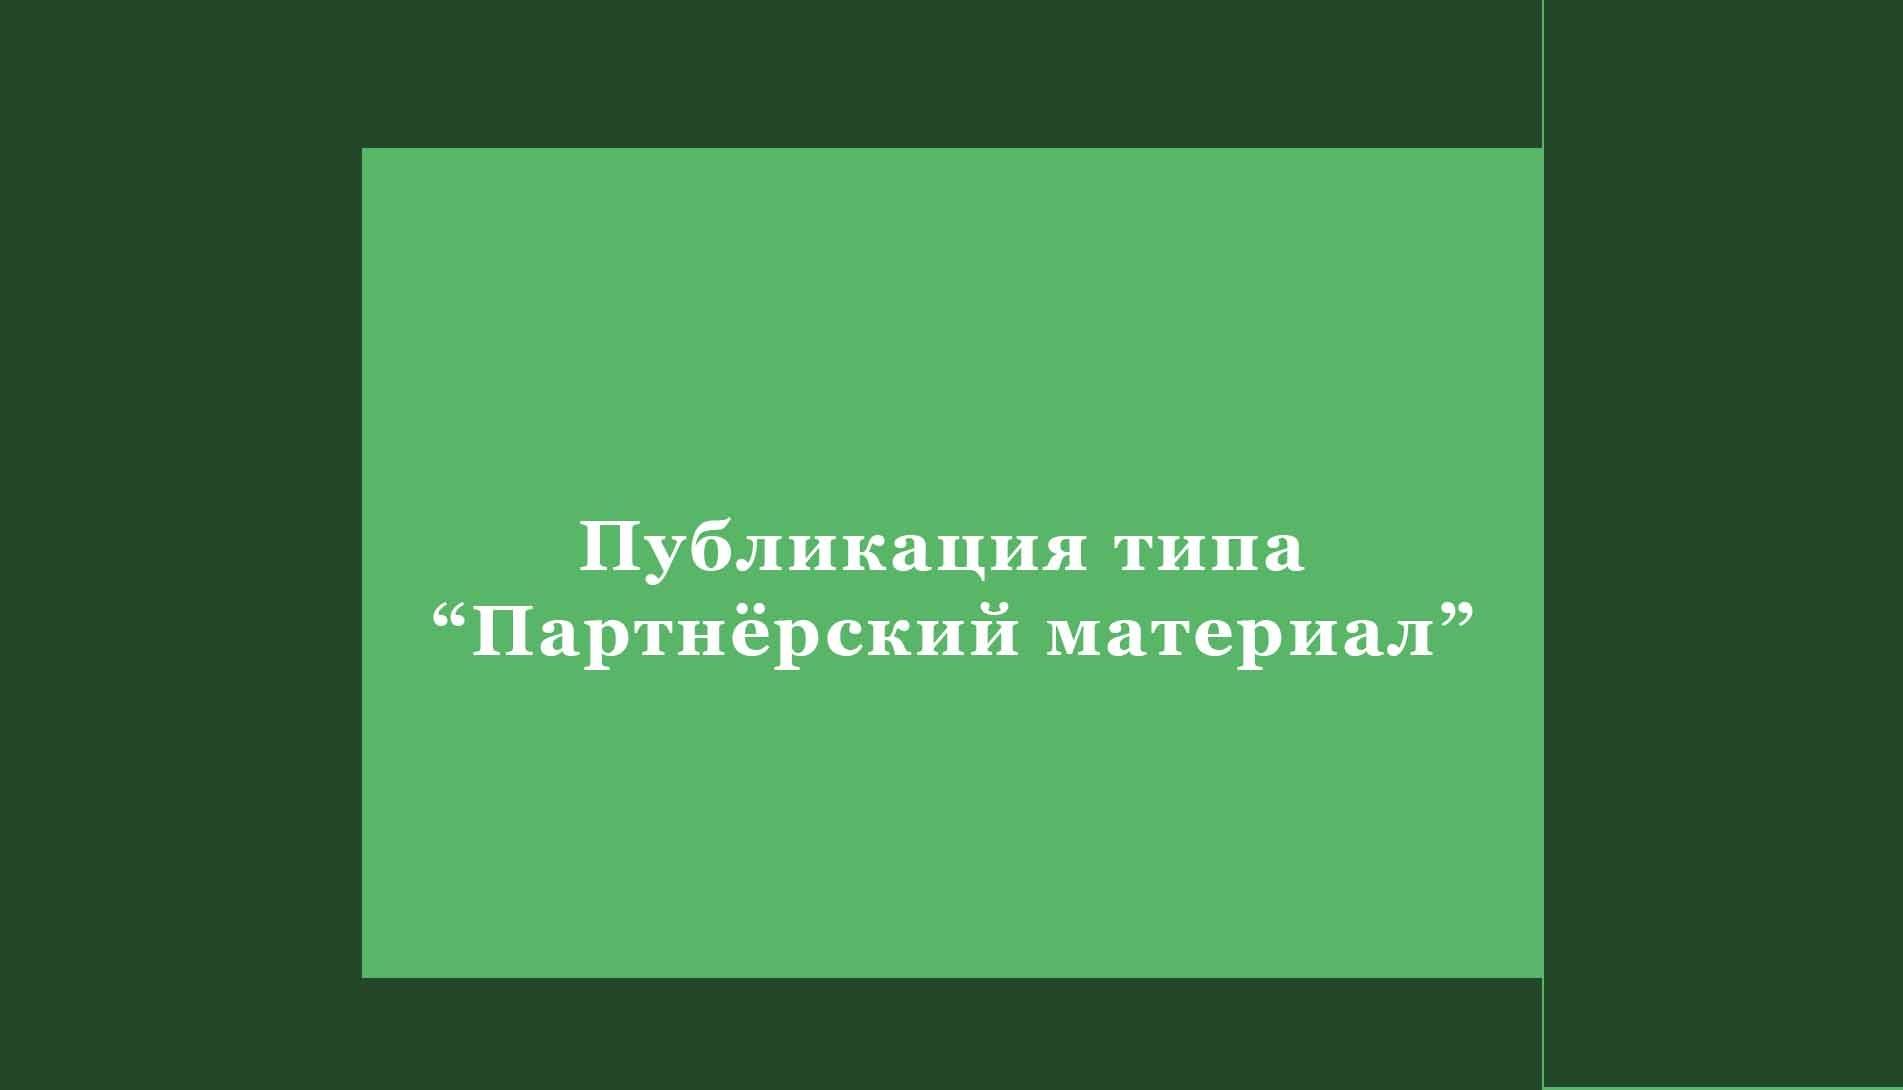 2_partnyorskiy_material_glavnaya_fotografiya_publikacii_.jpg